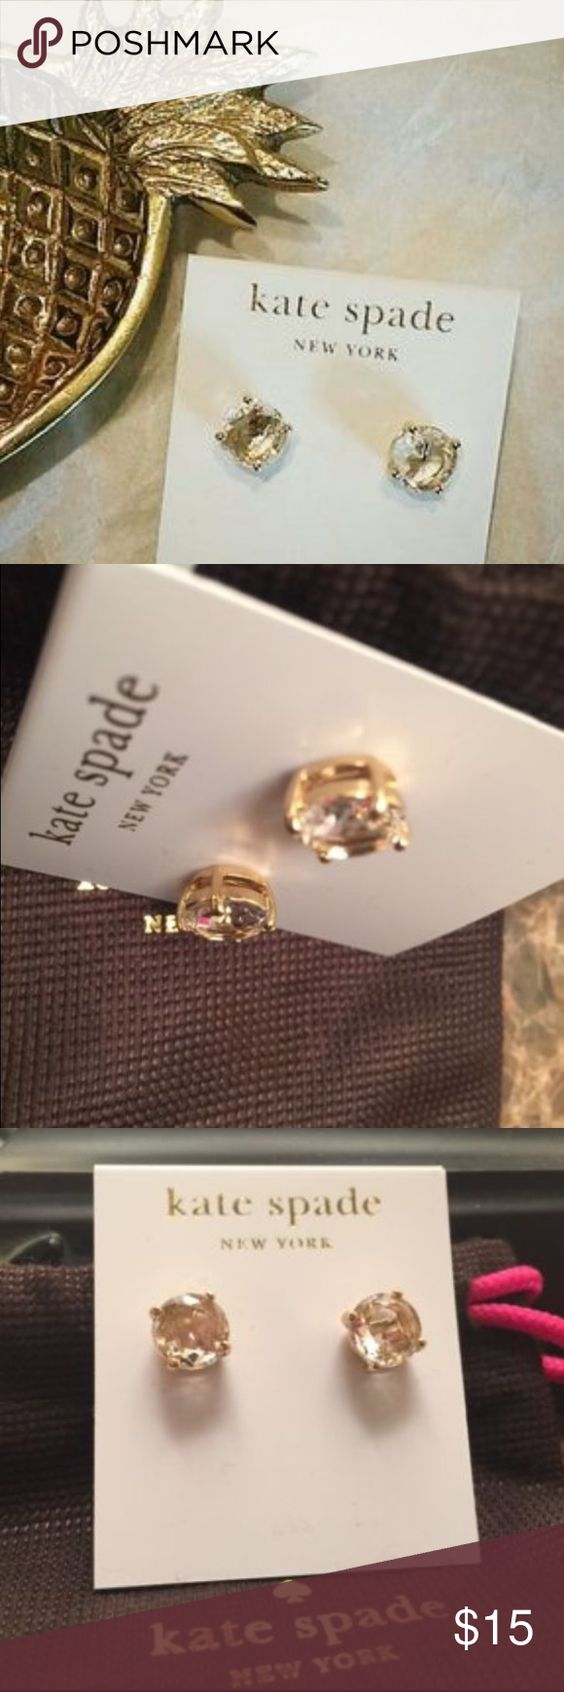 Kate Spade Gum Drop Earrings Authentic Kate Spade Gum Drop earrings in champagne color 💕 kate spade Jewelry Earrings